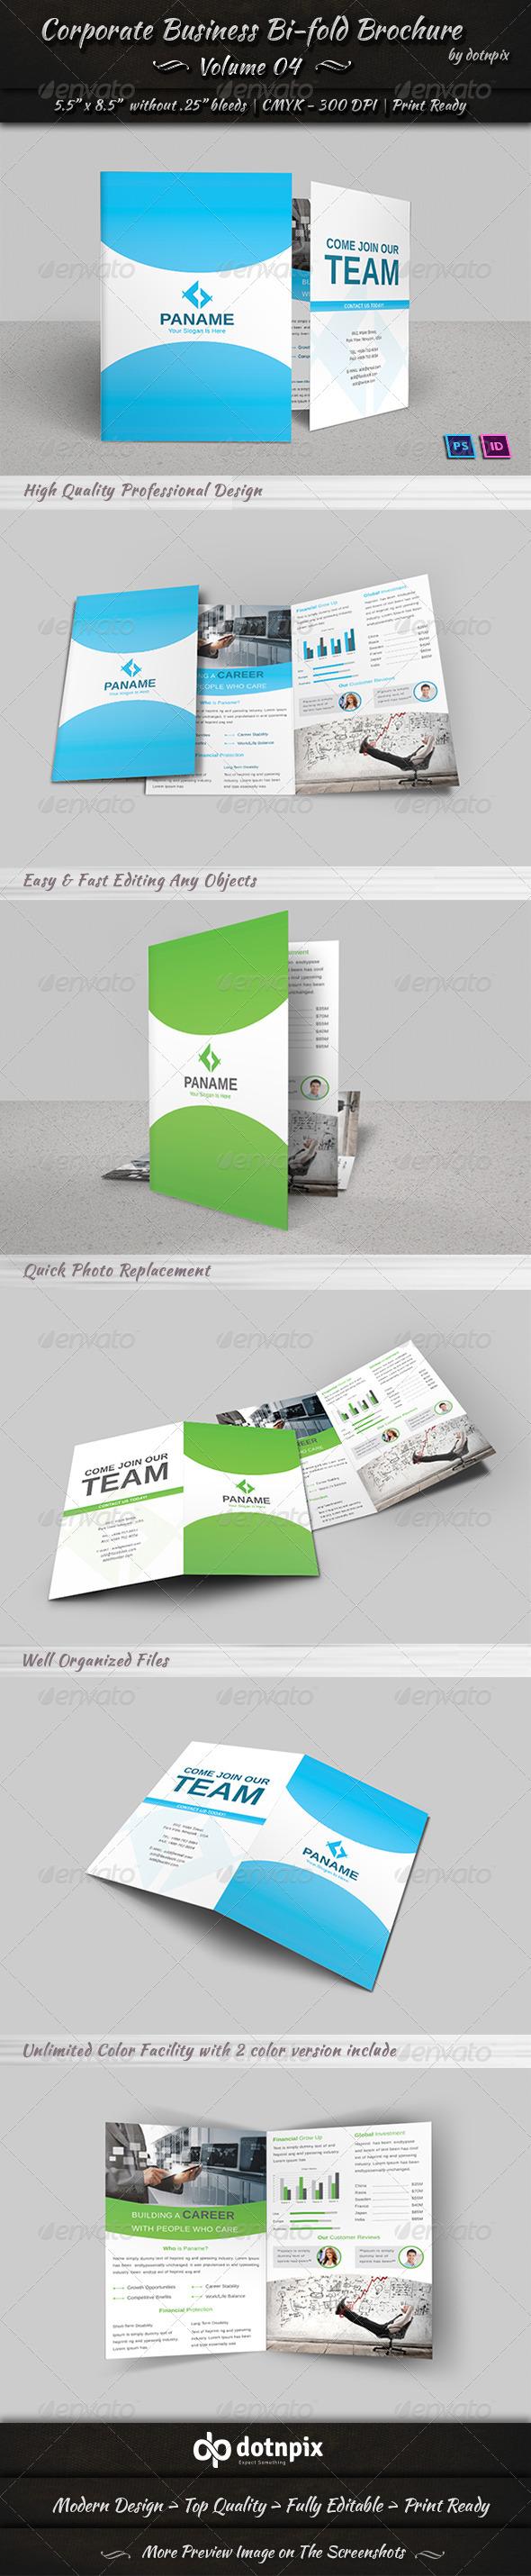 GraphicRiver Corporate Business Bi-Fold Brochure Volume 4 6948385